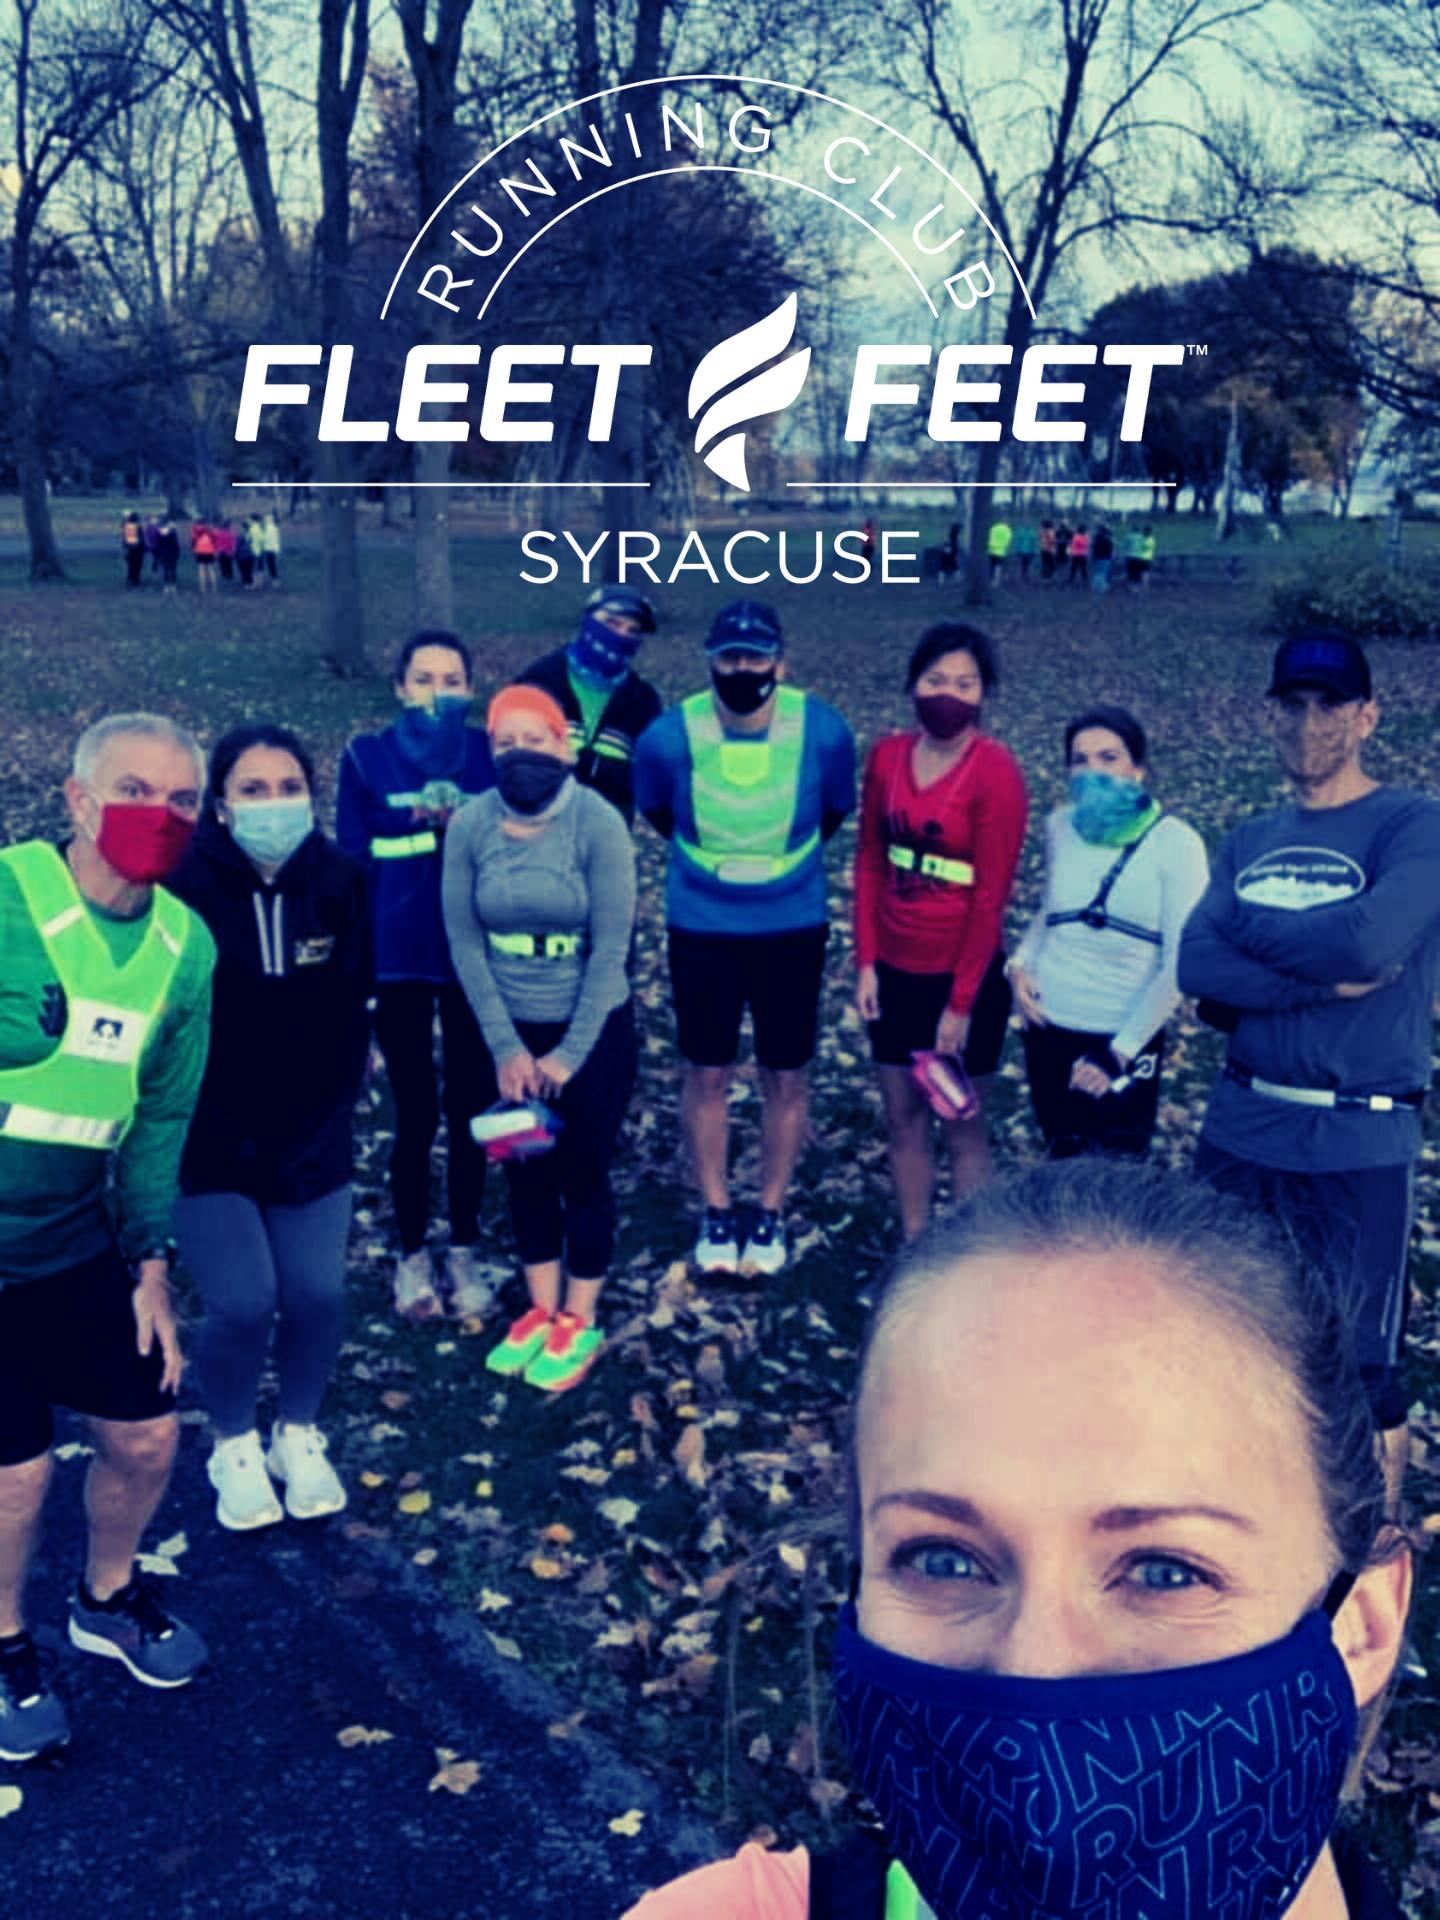 5k, 10k, marathon, half marathon, running coaches and training in Syracuse, New York